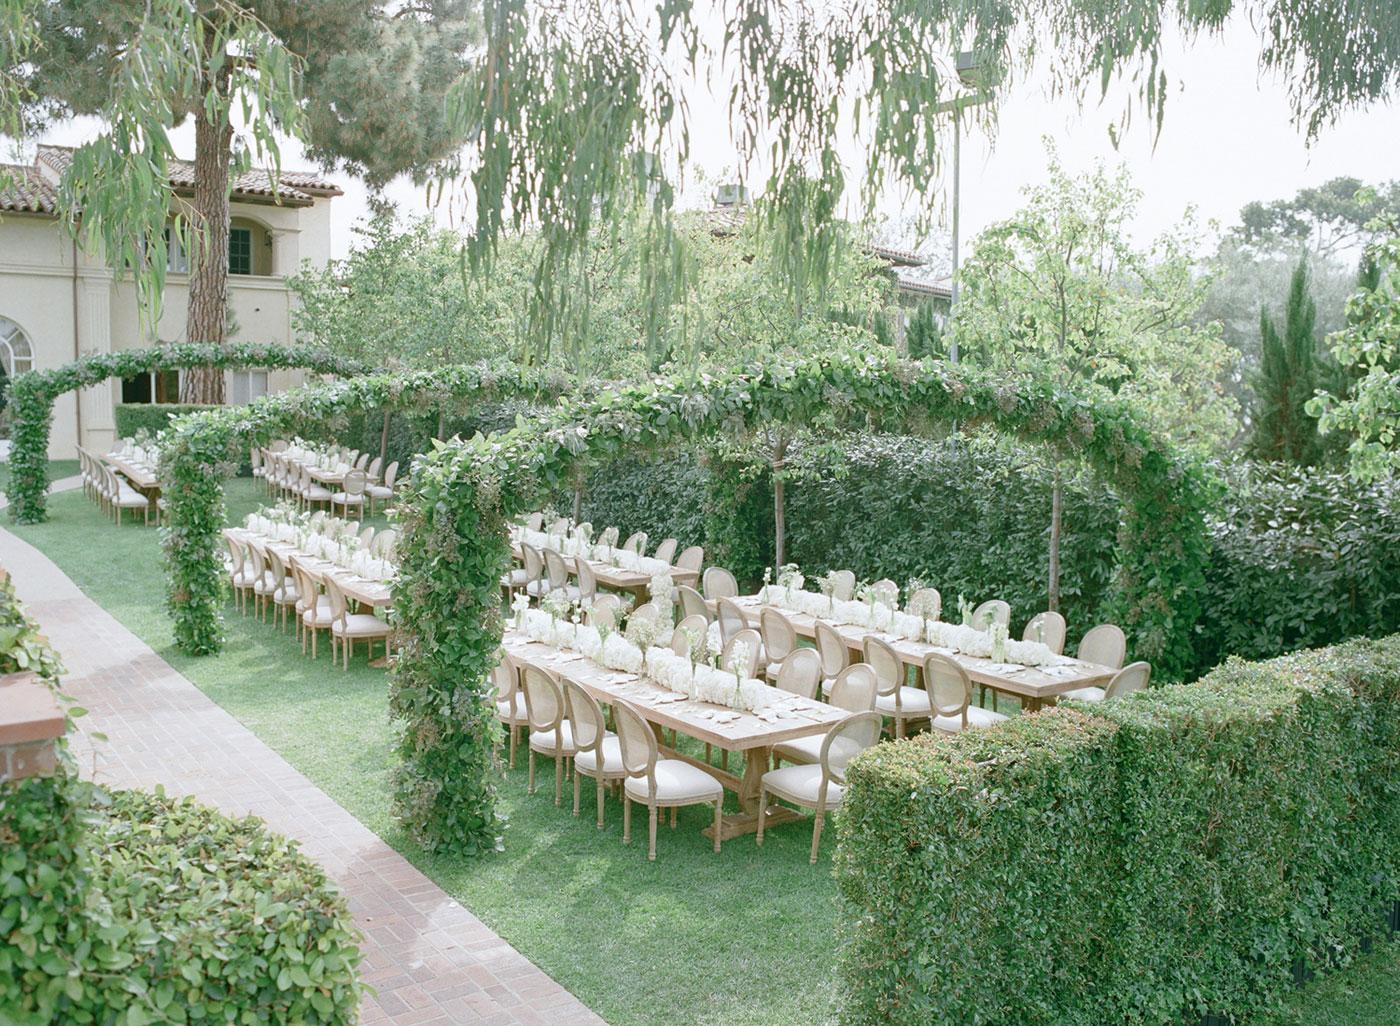 Green hedges surrounding outdoor wedding reception